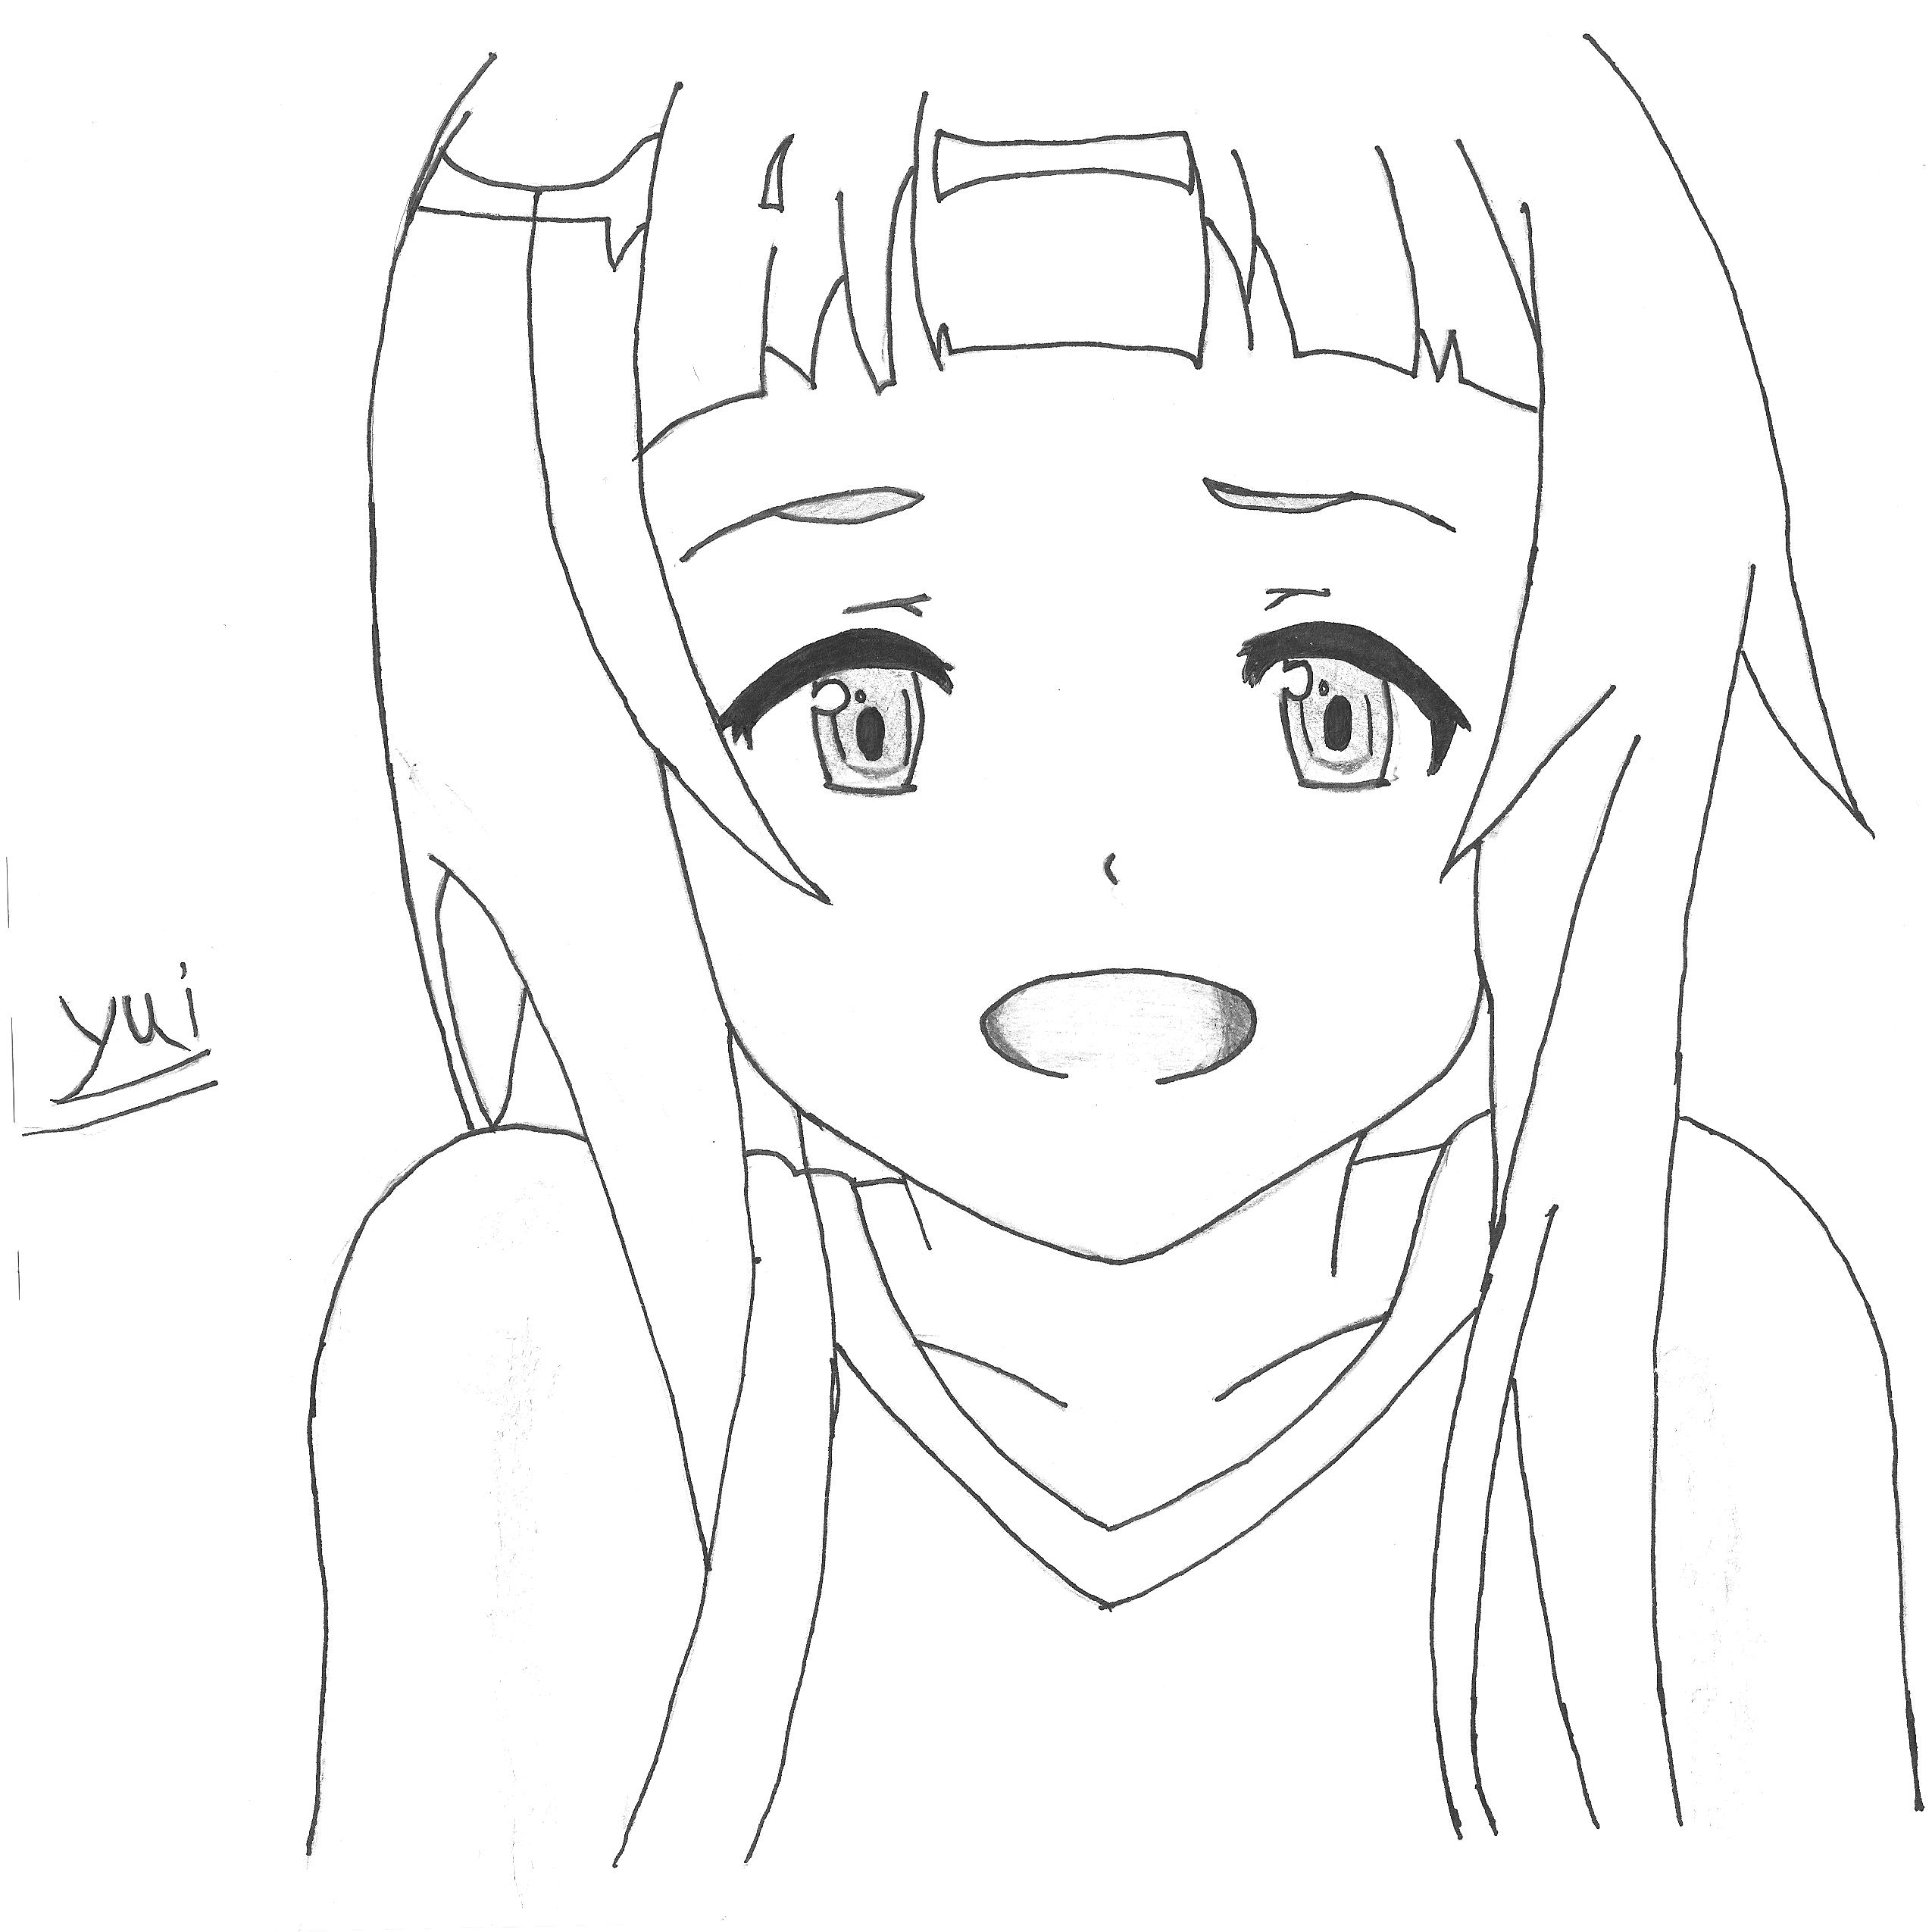 Yui Sword Art line by Kirito23 on DeviantArt